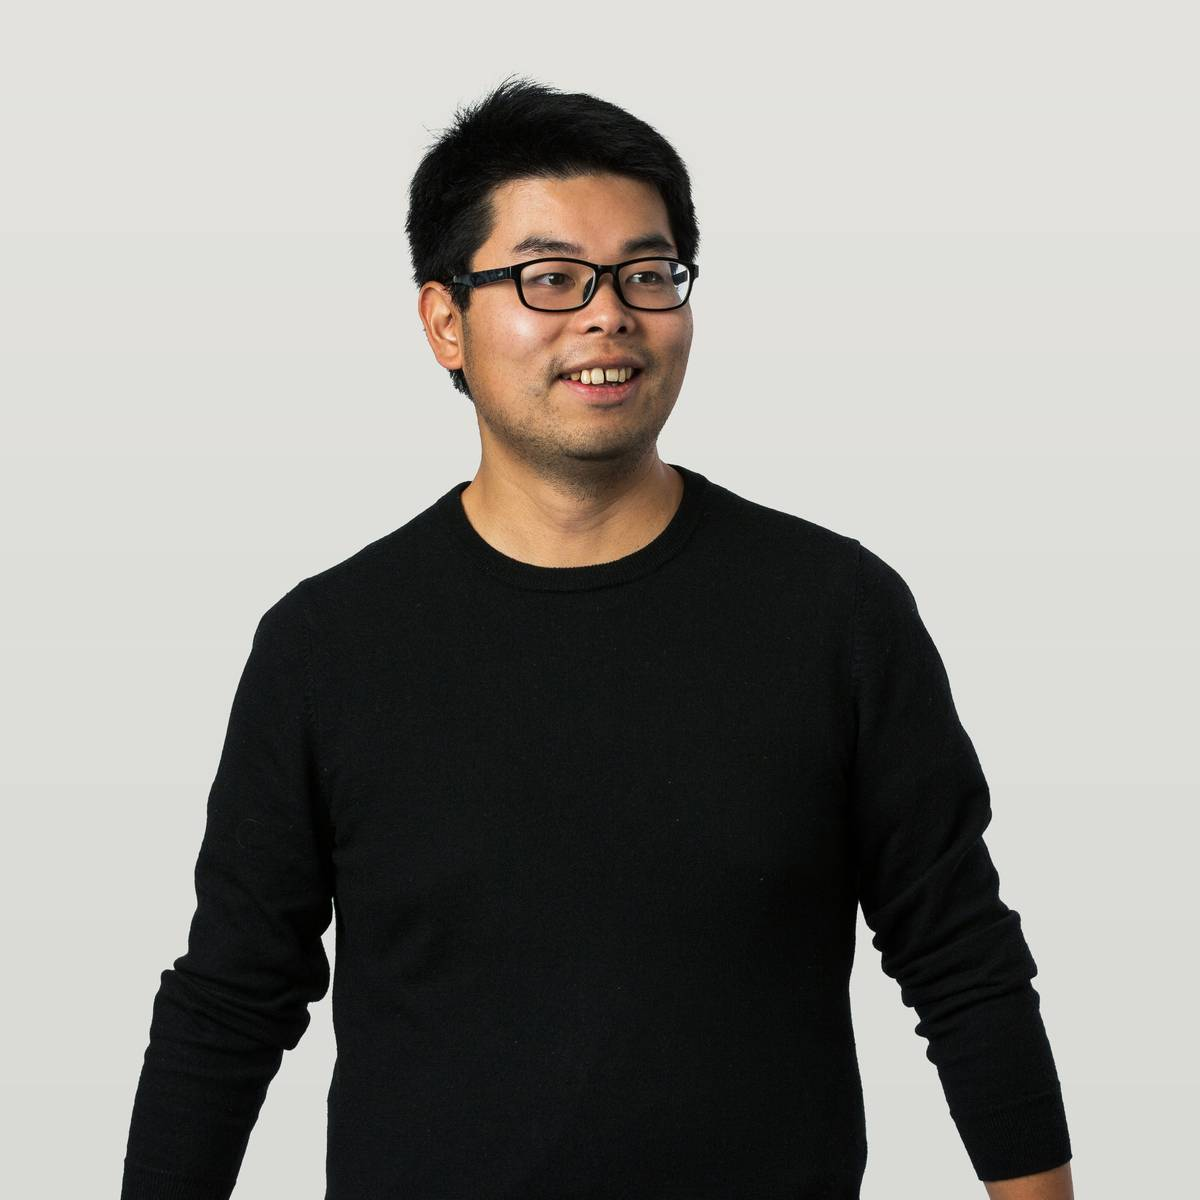 A profile image of Alex Li